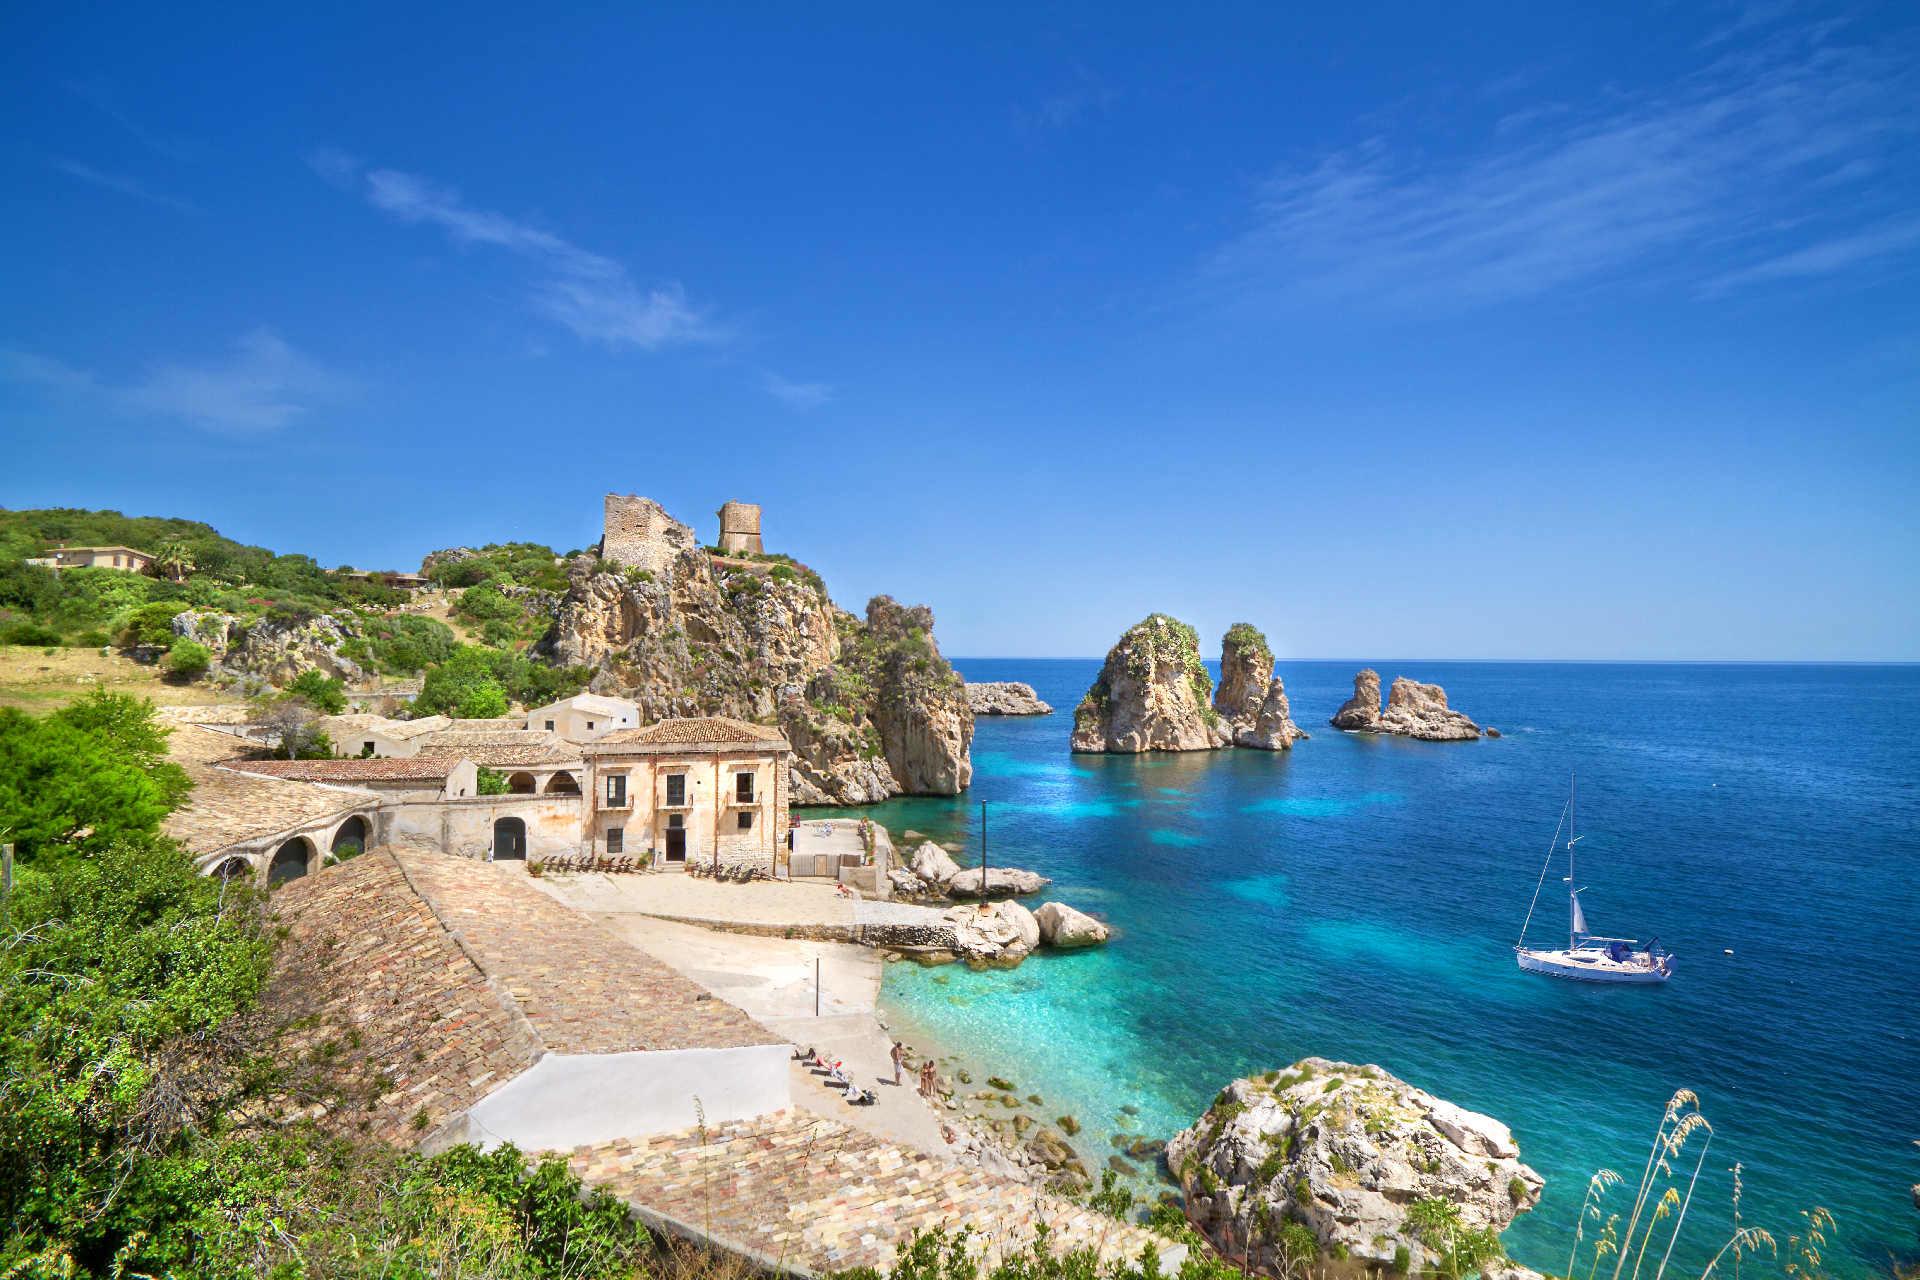 Experiencia en Catania, Italia por Lina